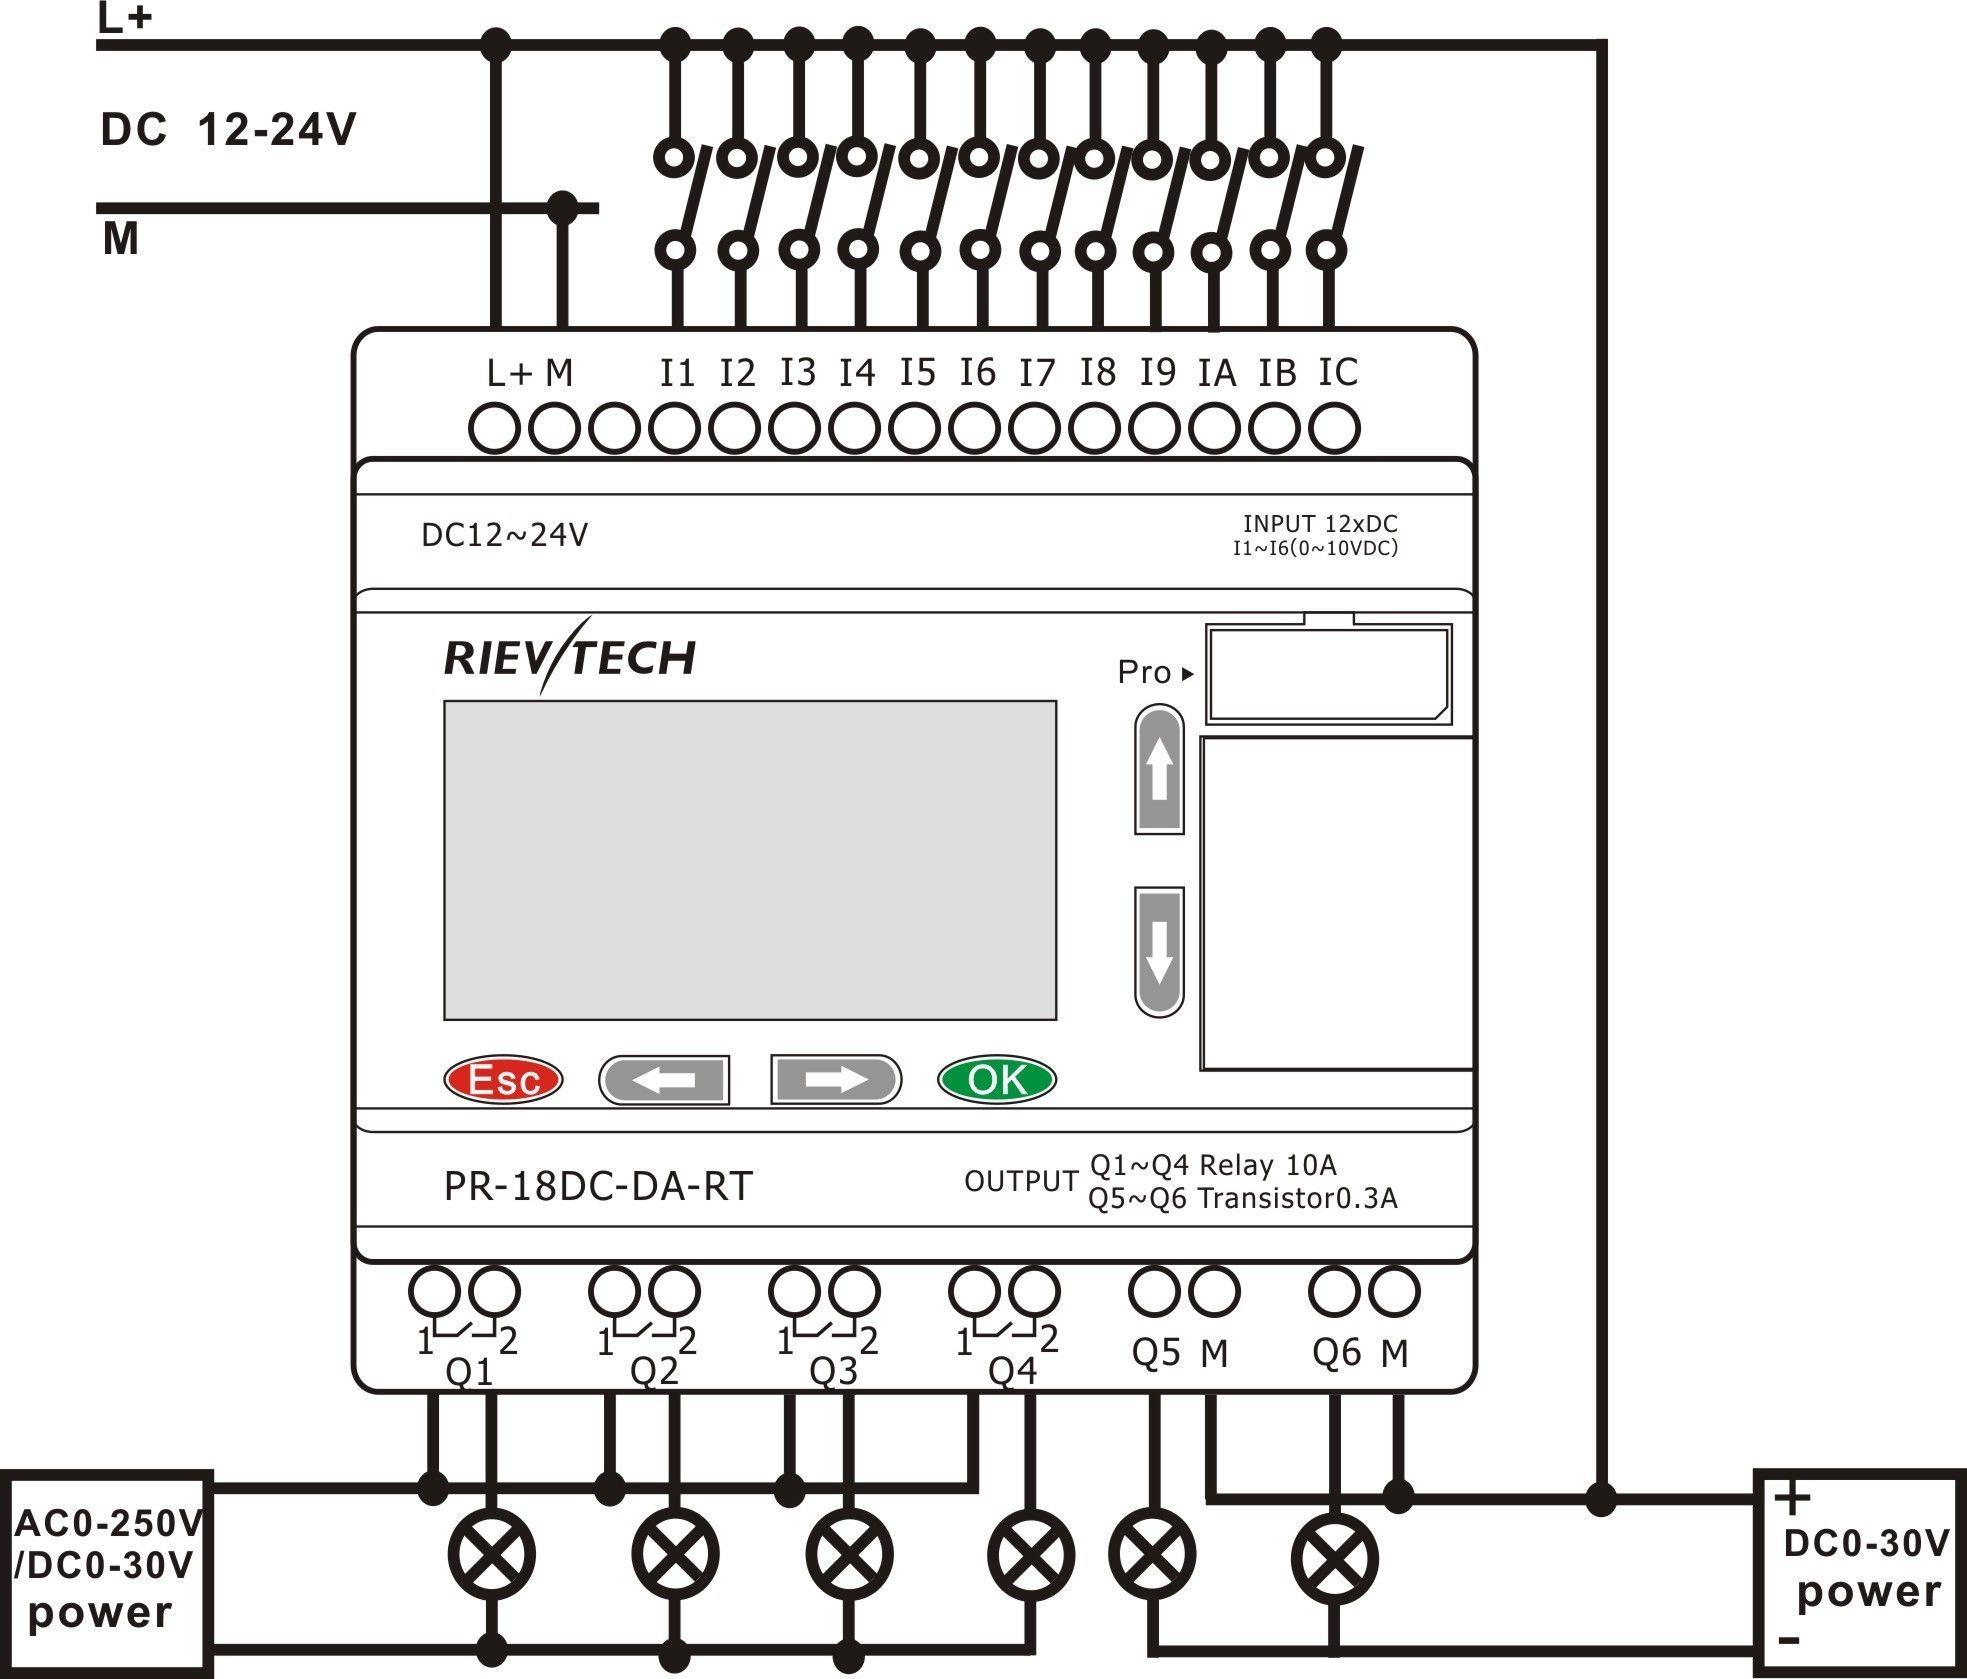 Micro820 Plc Wiring Diagram Diagram, Ladder logic, Wire